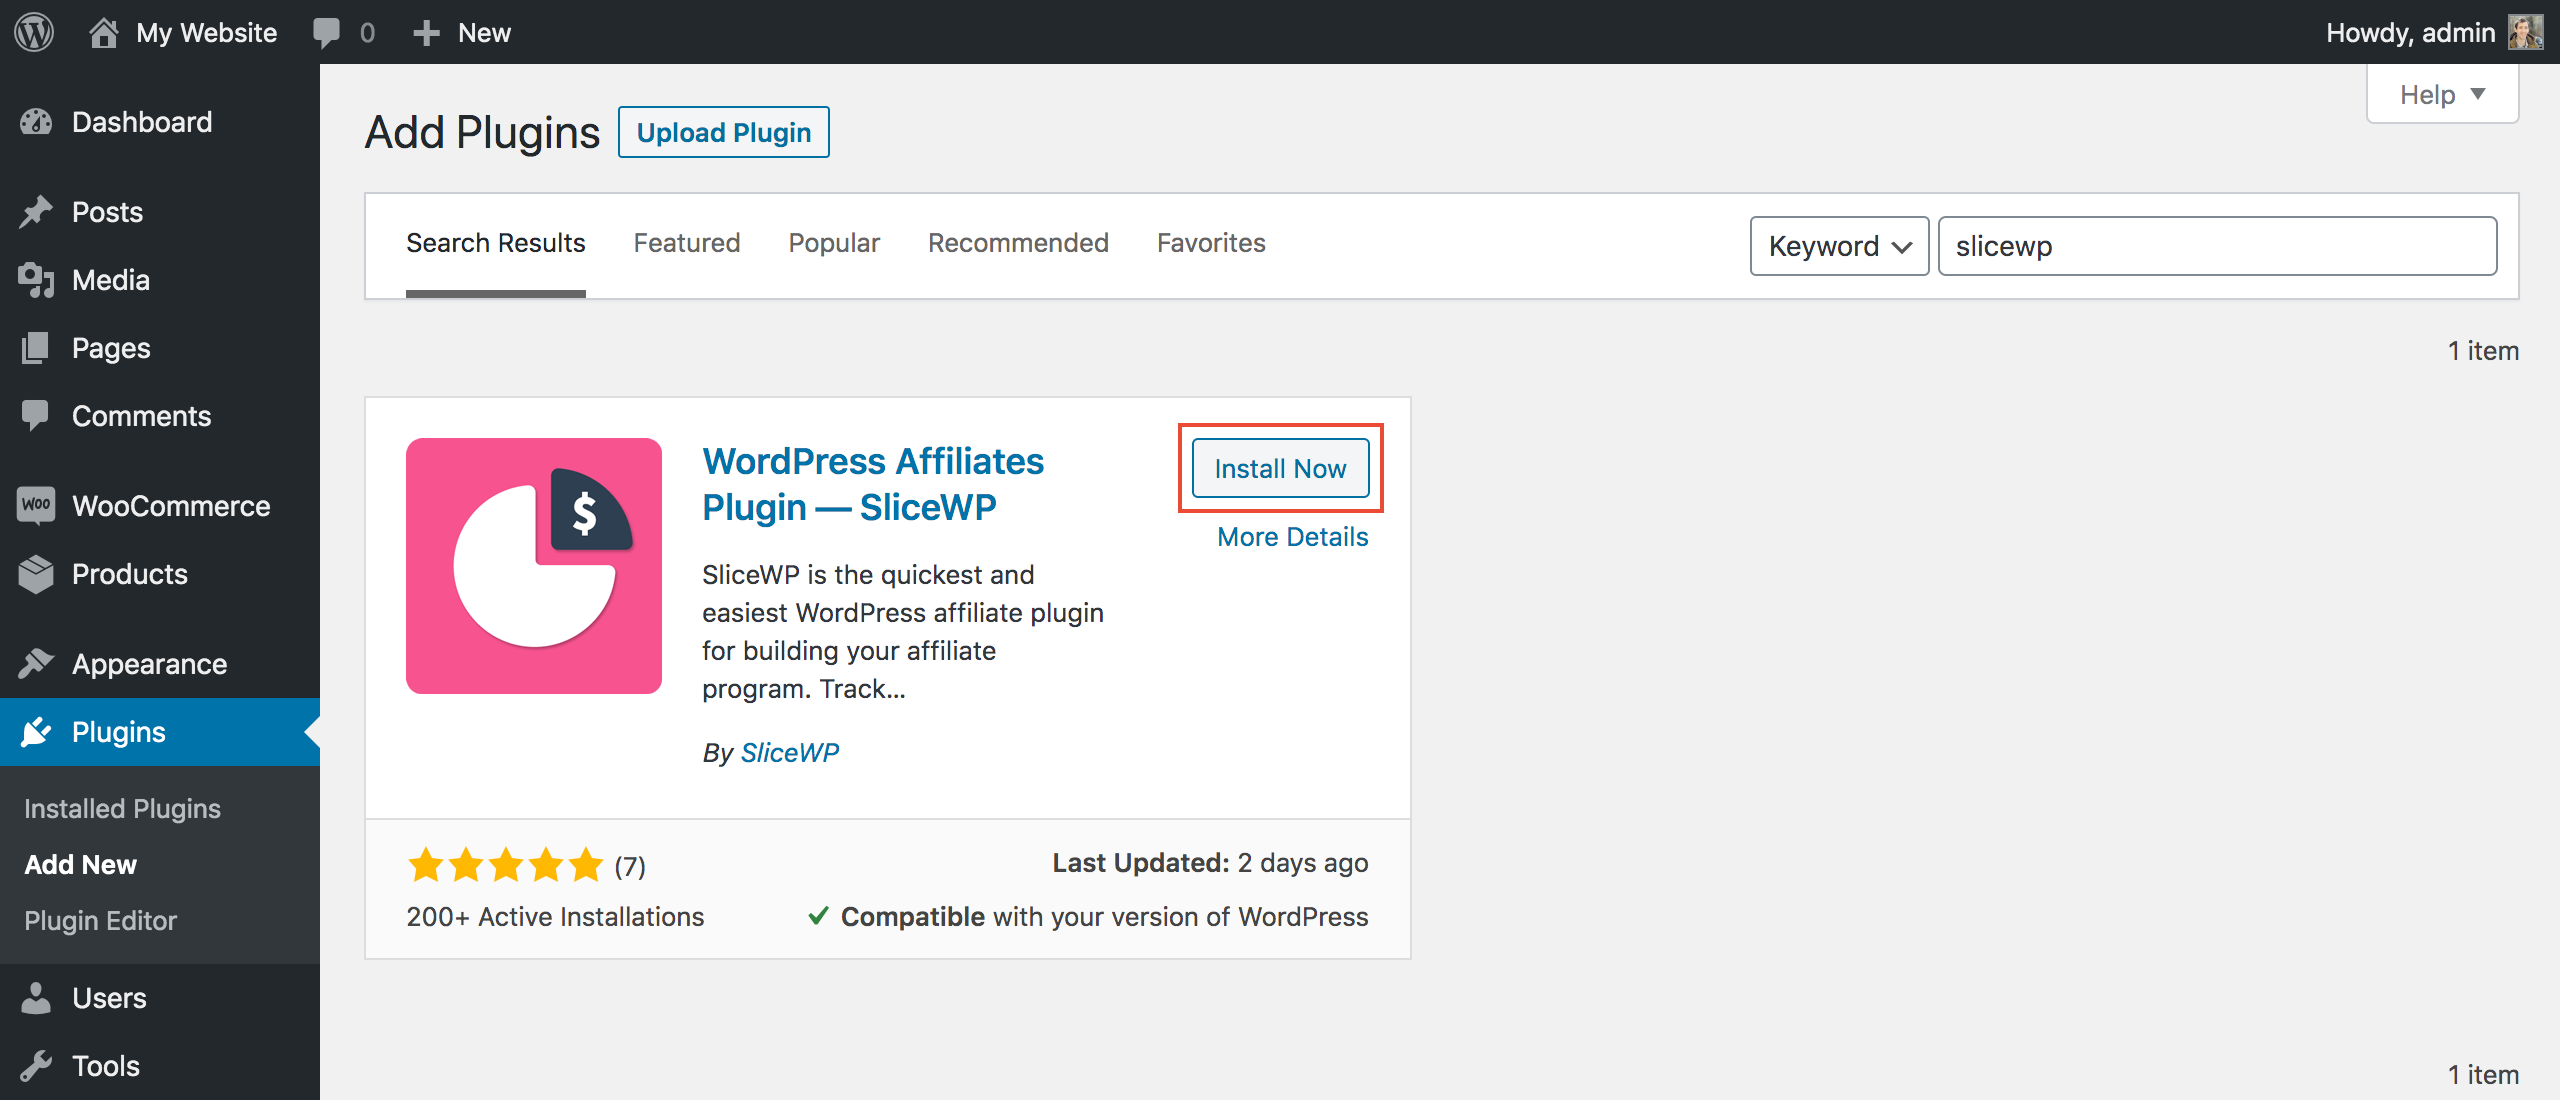 Installing SliceWP from WordPress' add new plugin admin page.